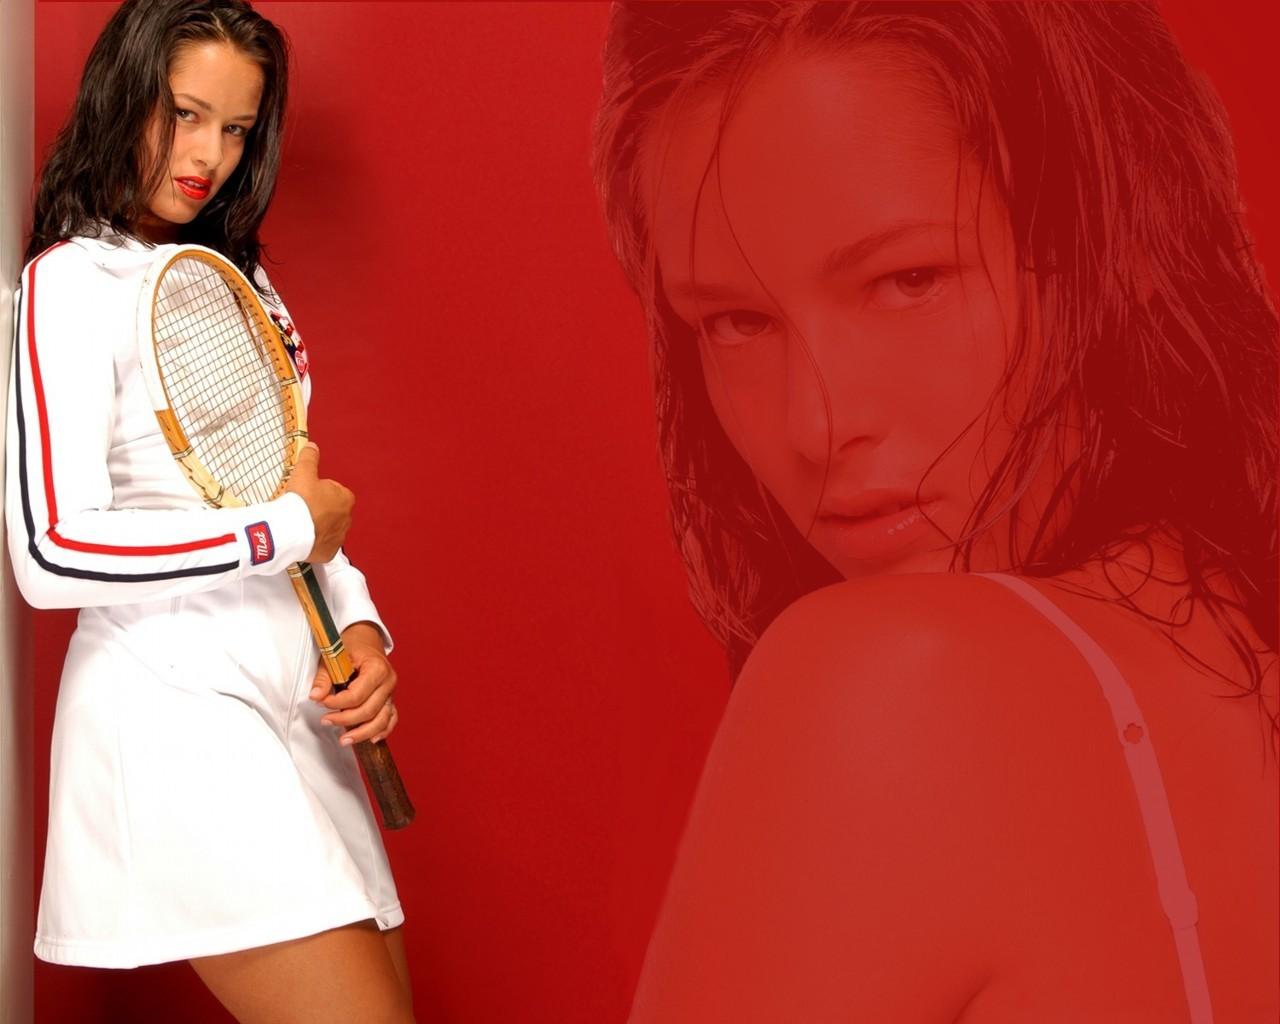 http://2.bp.blogspot.com/_G2zvy1koc3I/S78tZ4UNzzI/AAAAAAAABOM/NG83IUS7goI/s1600/ana-ivanovic-40-tennis-feminin-sports-loisirs.jpg